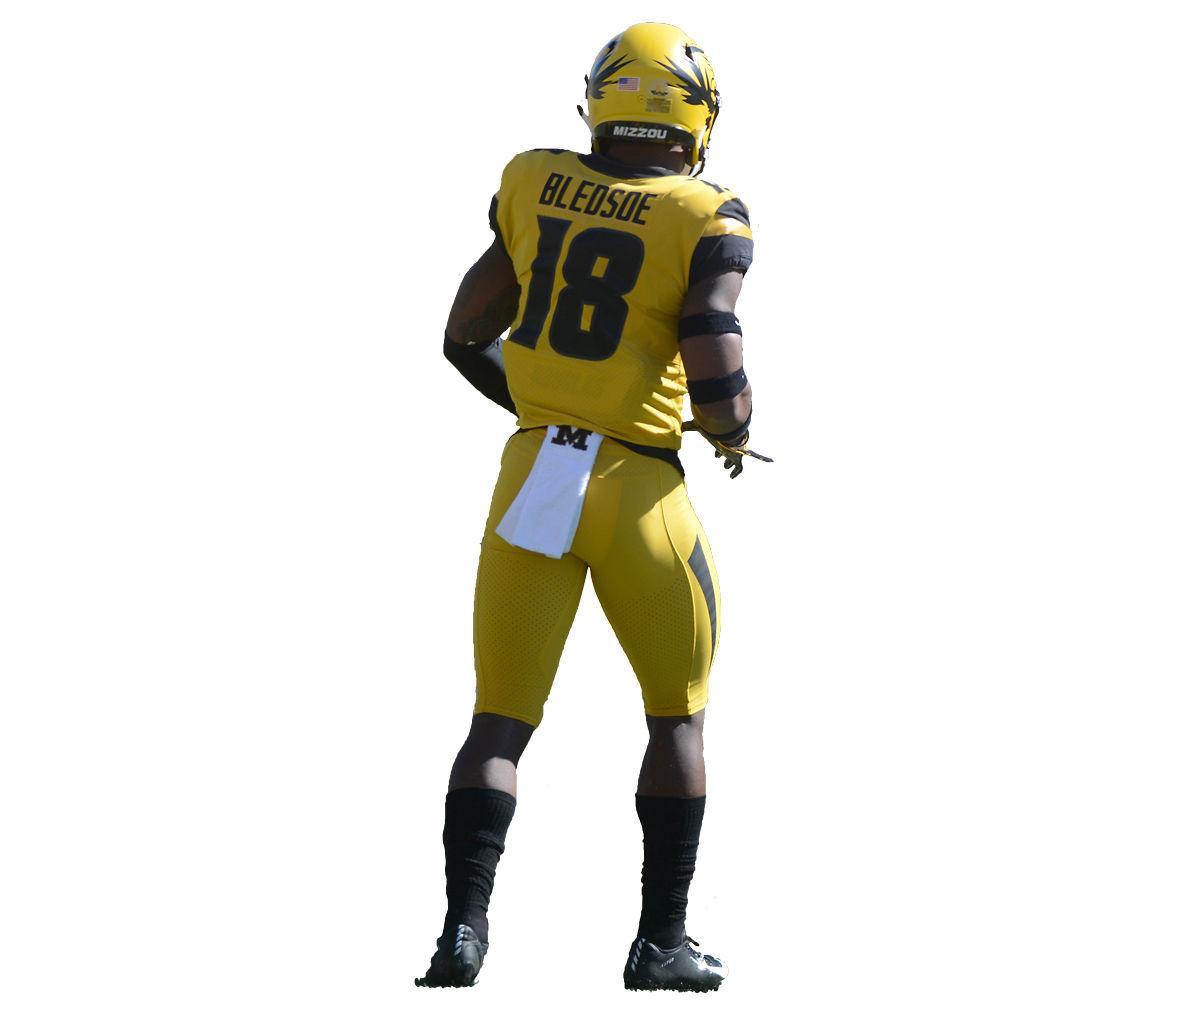 be9982d34b 'Make an impact': Are all those Missouri uniforms fashion dos or don'ts? |  Mizzou Football | columbiamissourian.com